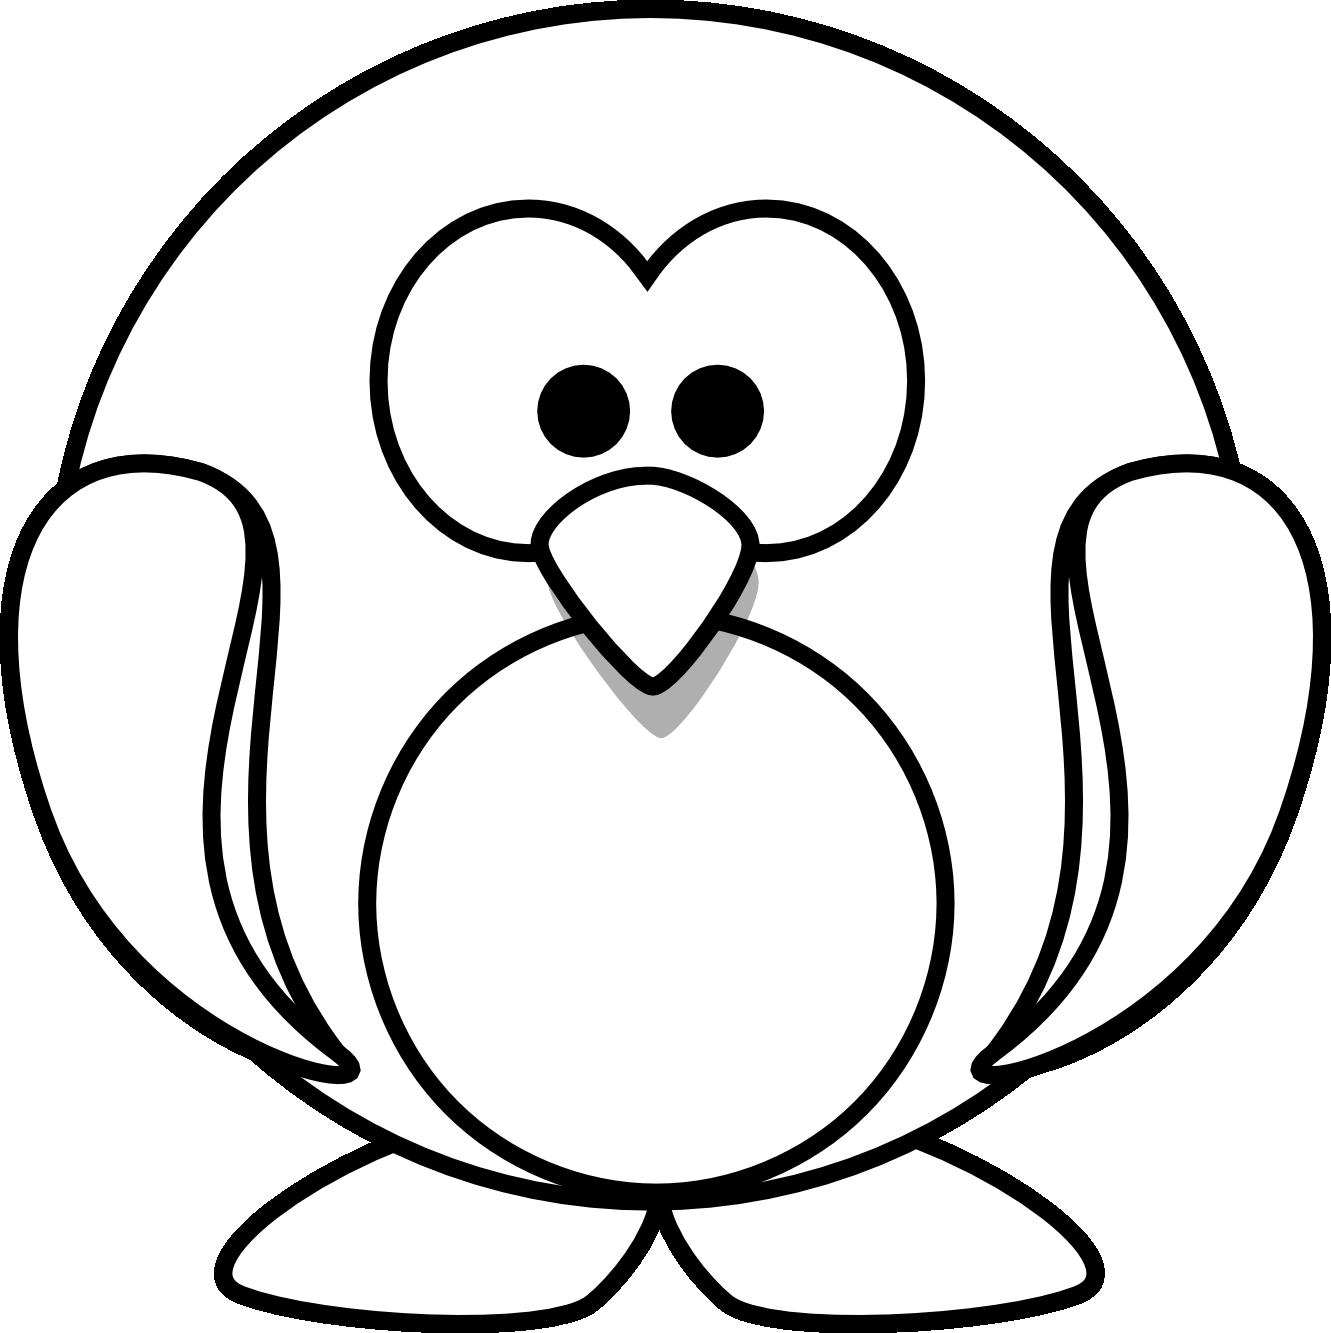 Penguin outline drawing at. Clipart penquin illustration